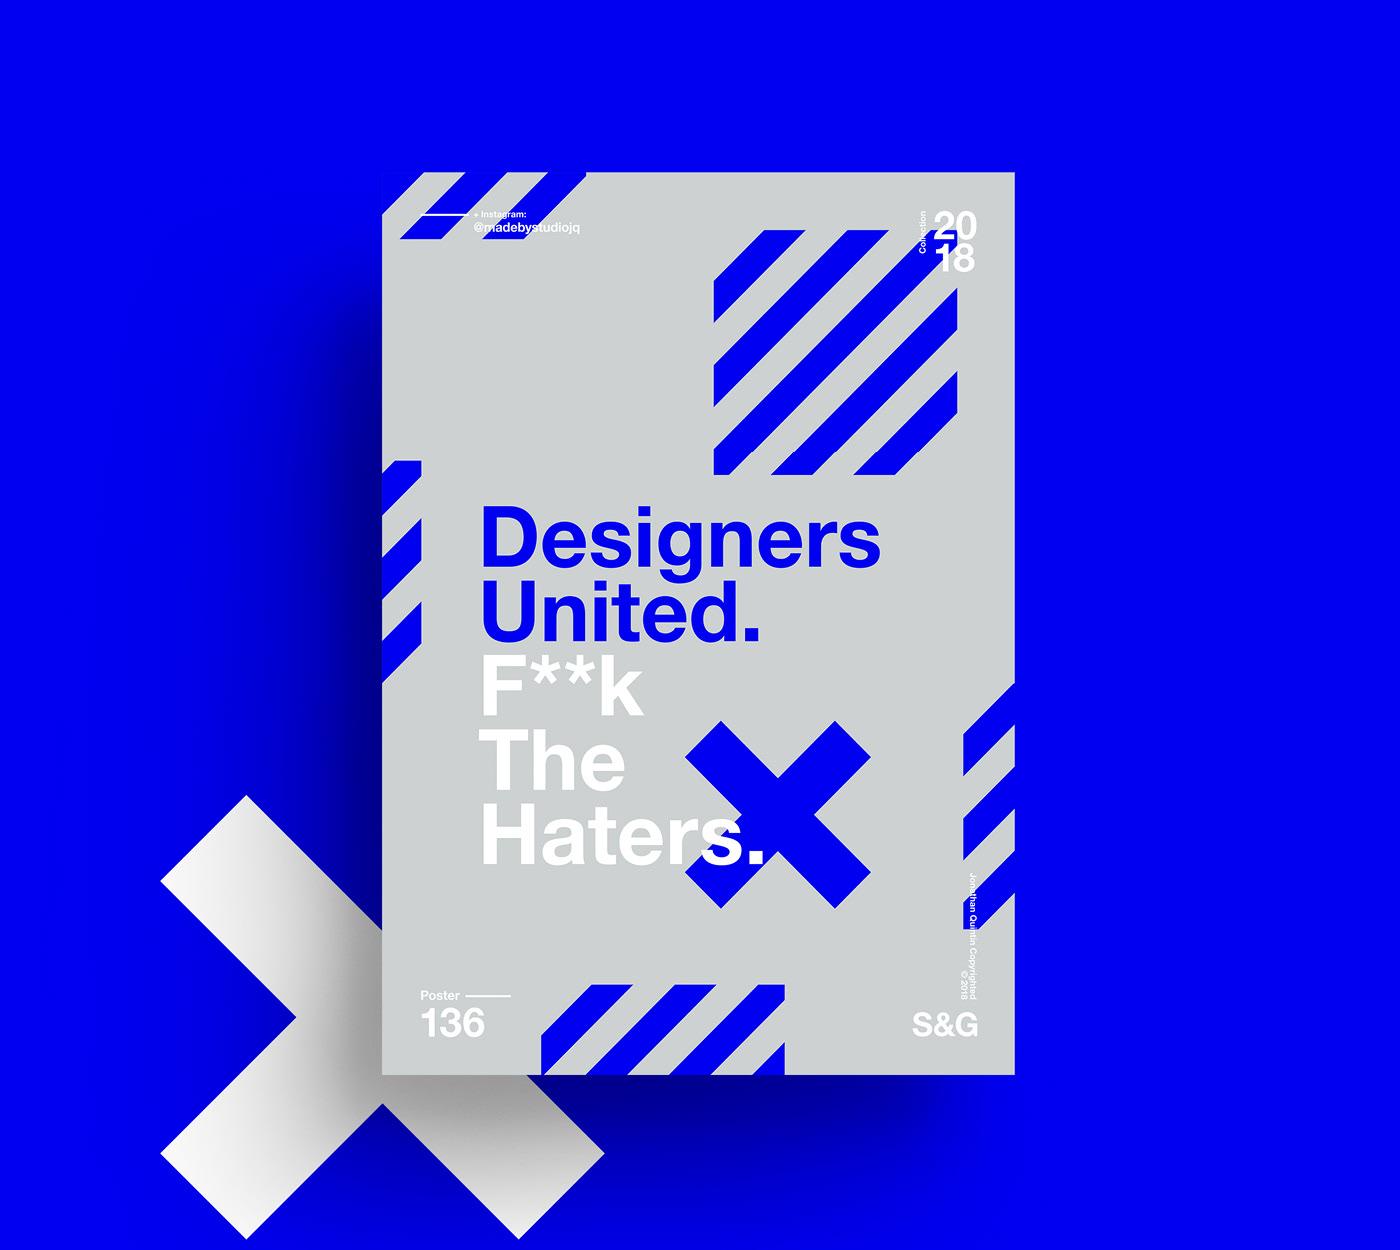 Blue & Gray Designers United Minimalist Poster Example